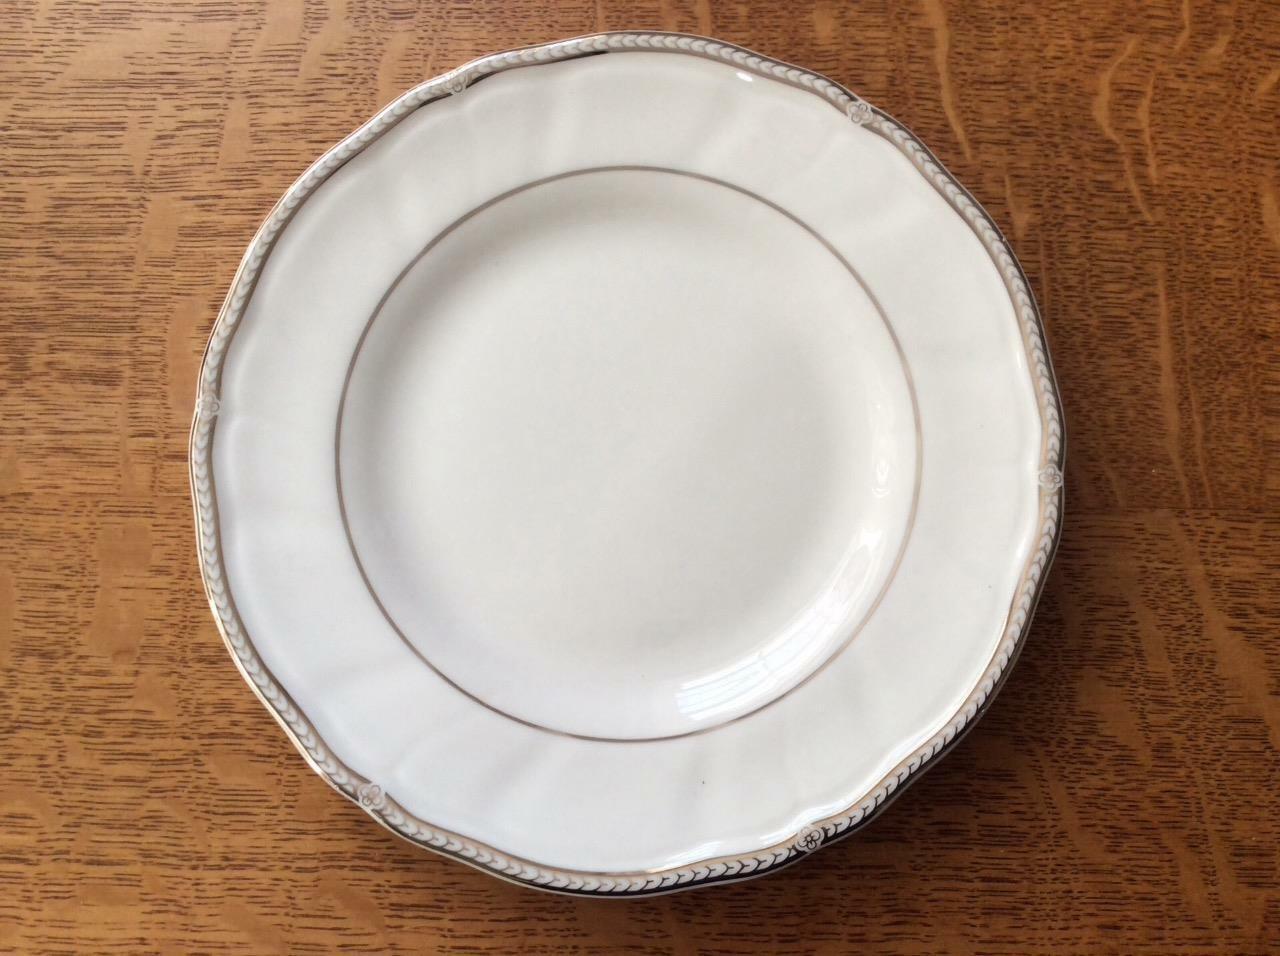 Pfaltzgraff Heritage White Stoneware Ceramic Salt and Pepper Shakers 5.75″ Tall